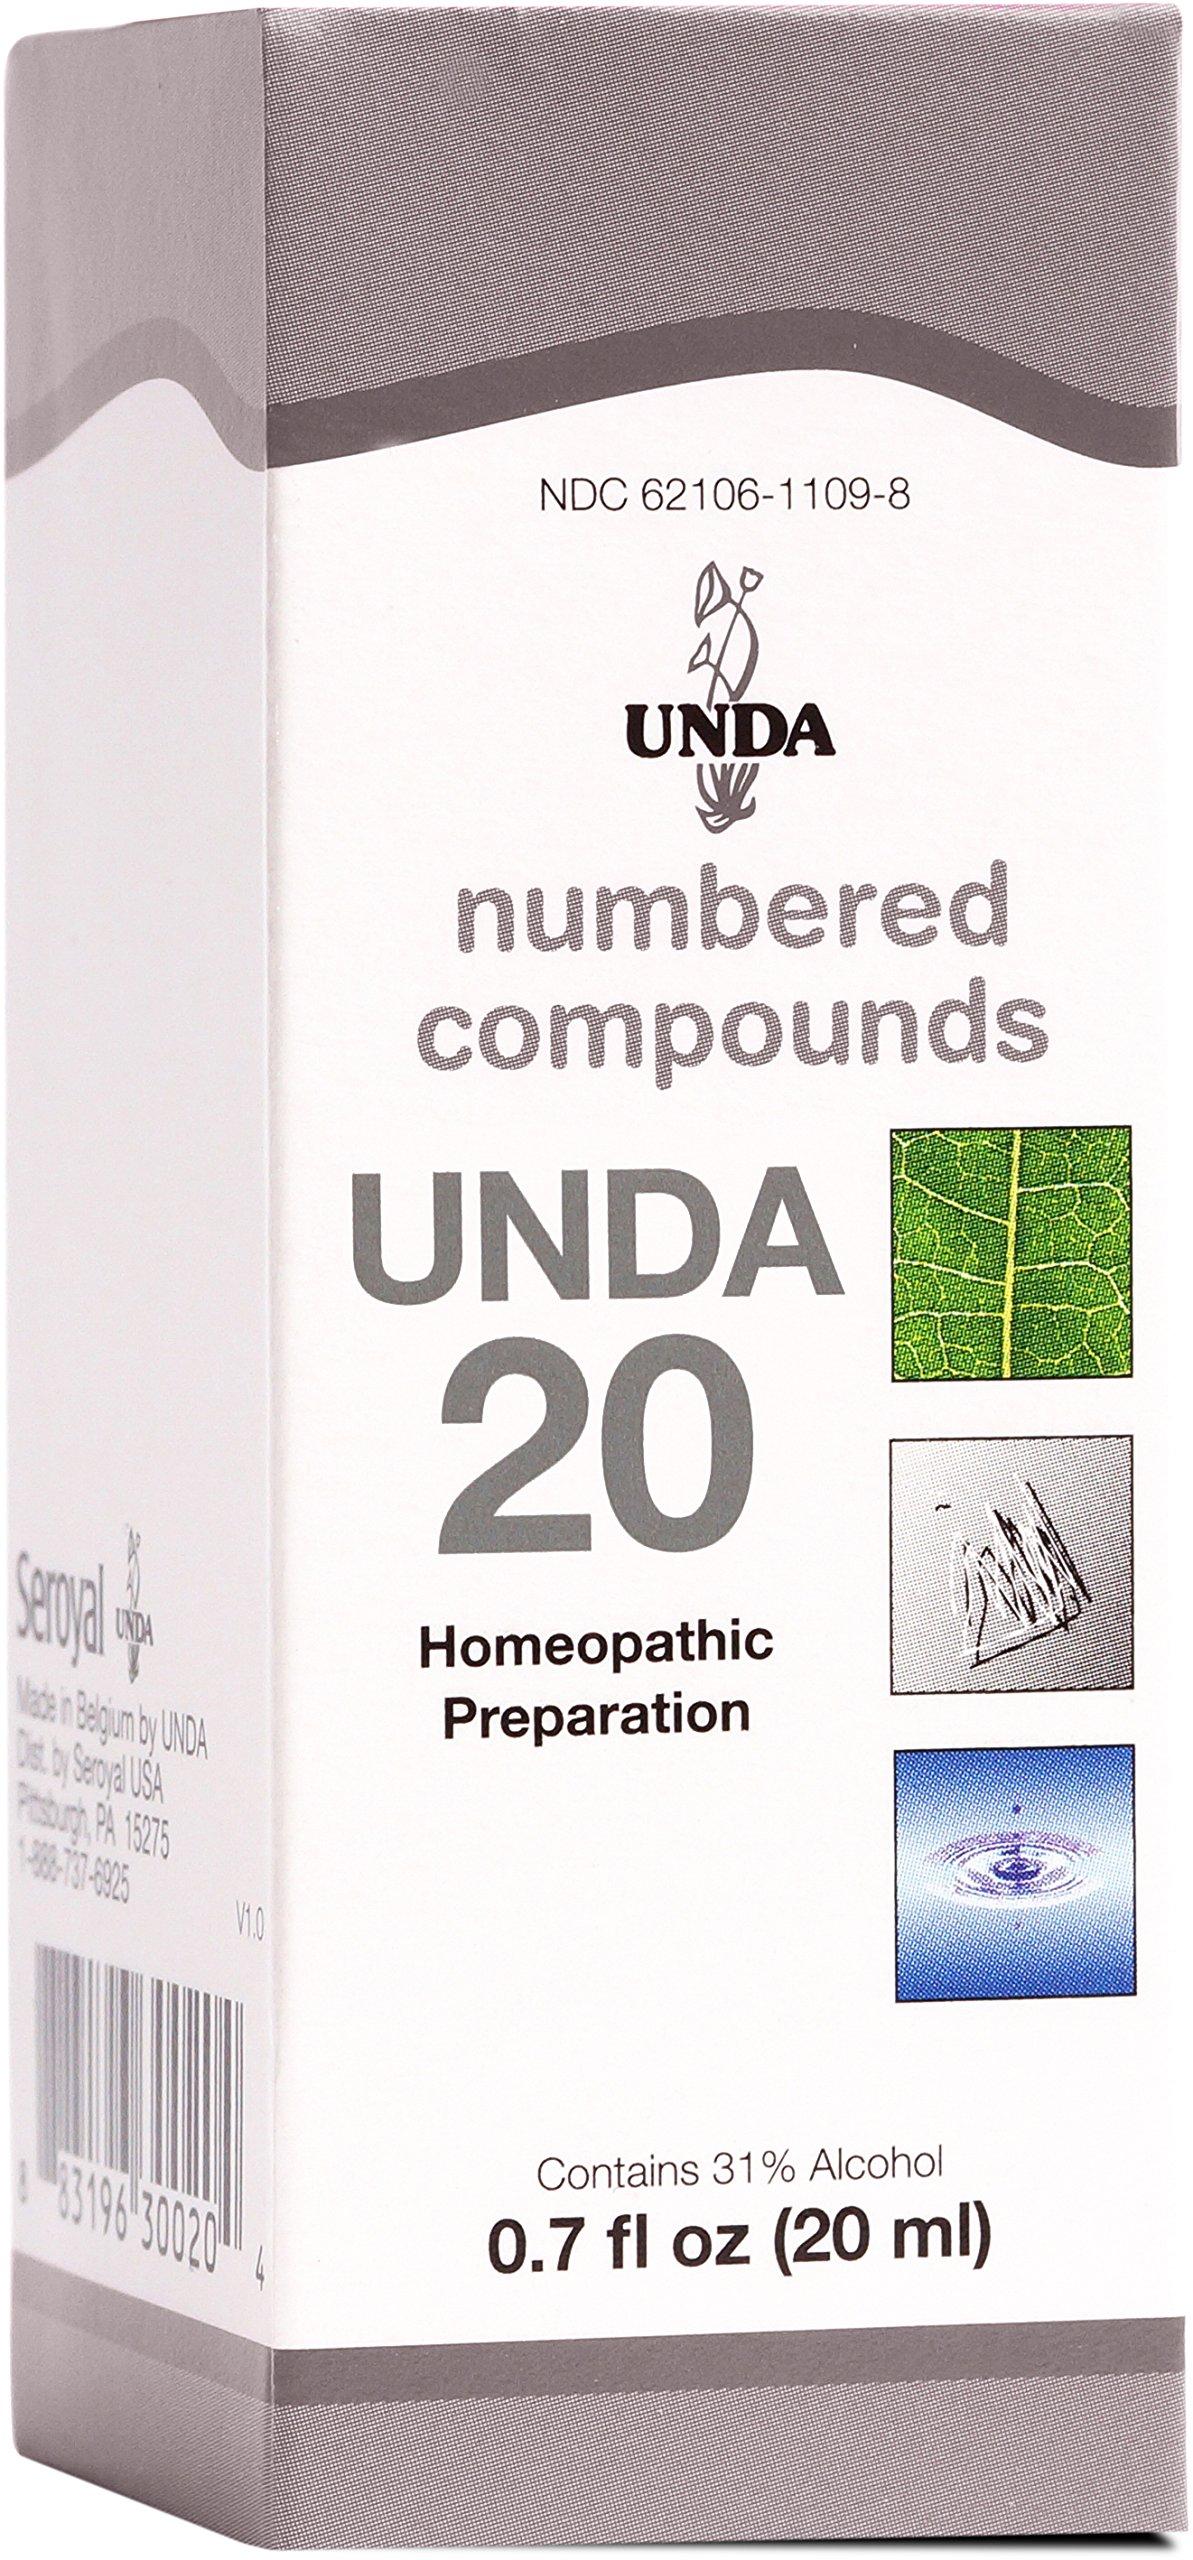 UNDA - UNDA 20 Numbered Compounds - Homeopathic Preparation - 0.7 fl. oz.